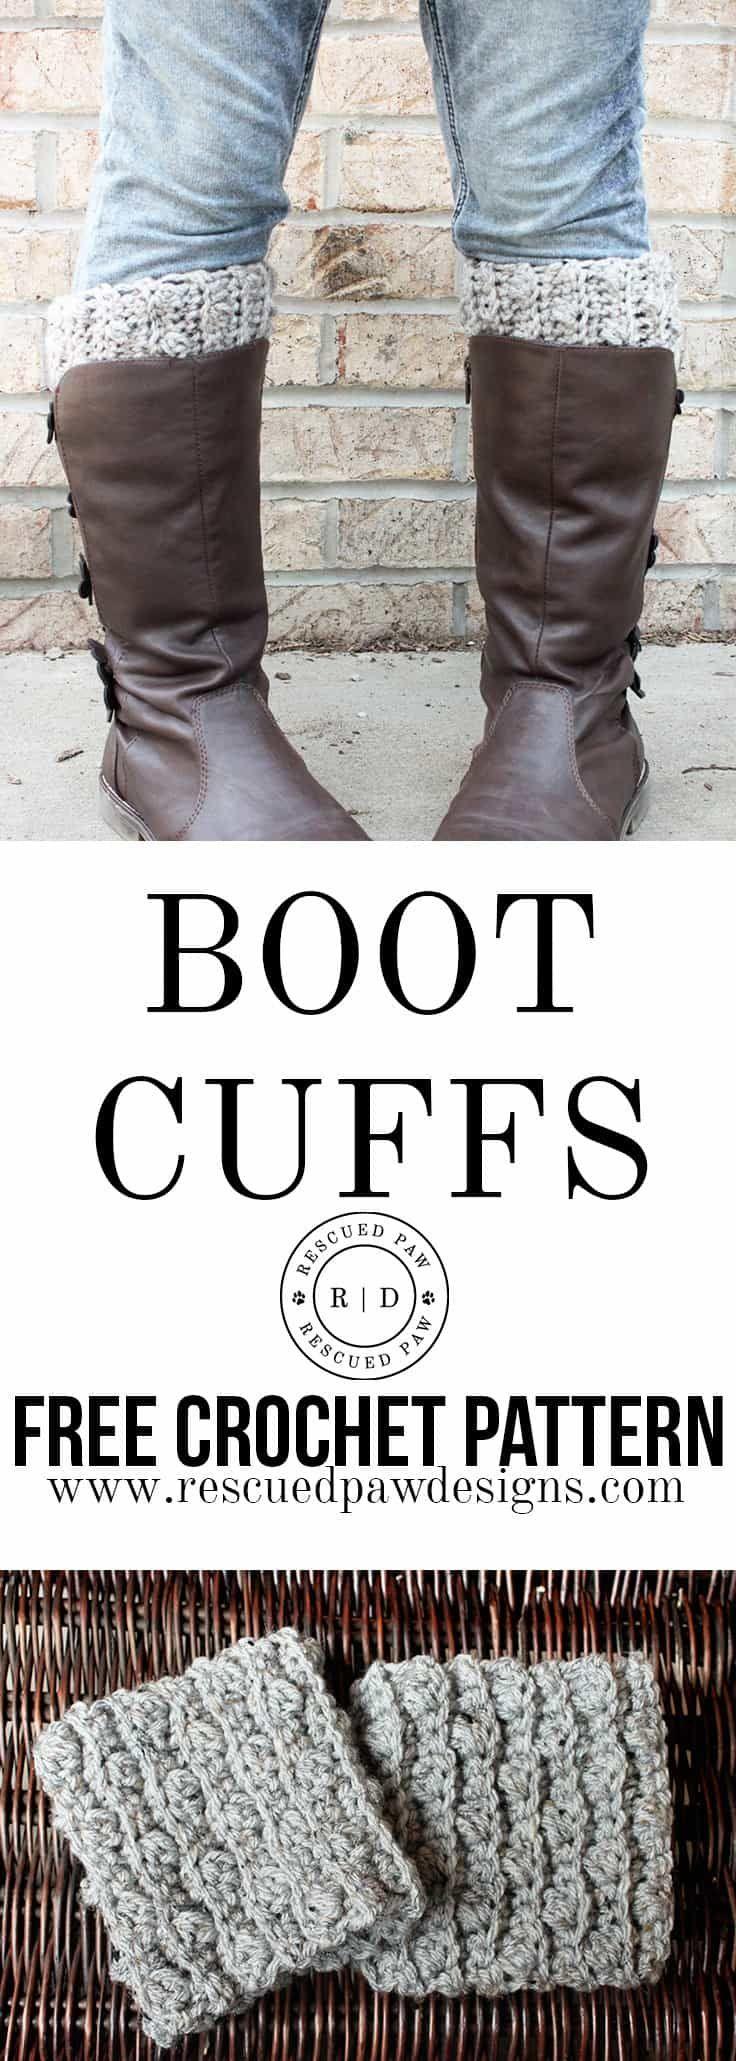 Boot Cuffs Pattern - Free Crochet Pattern | Patrones libres de ...